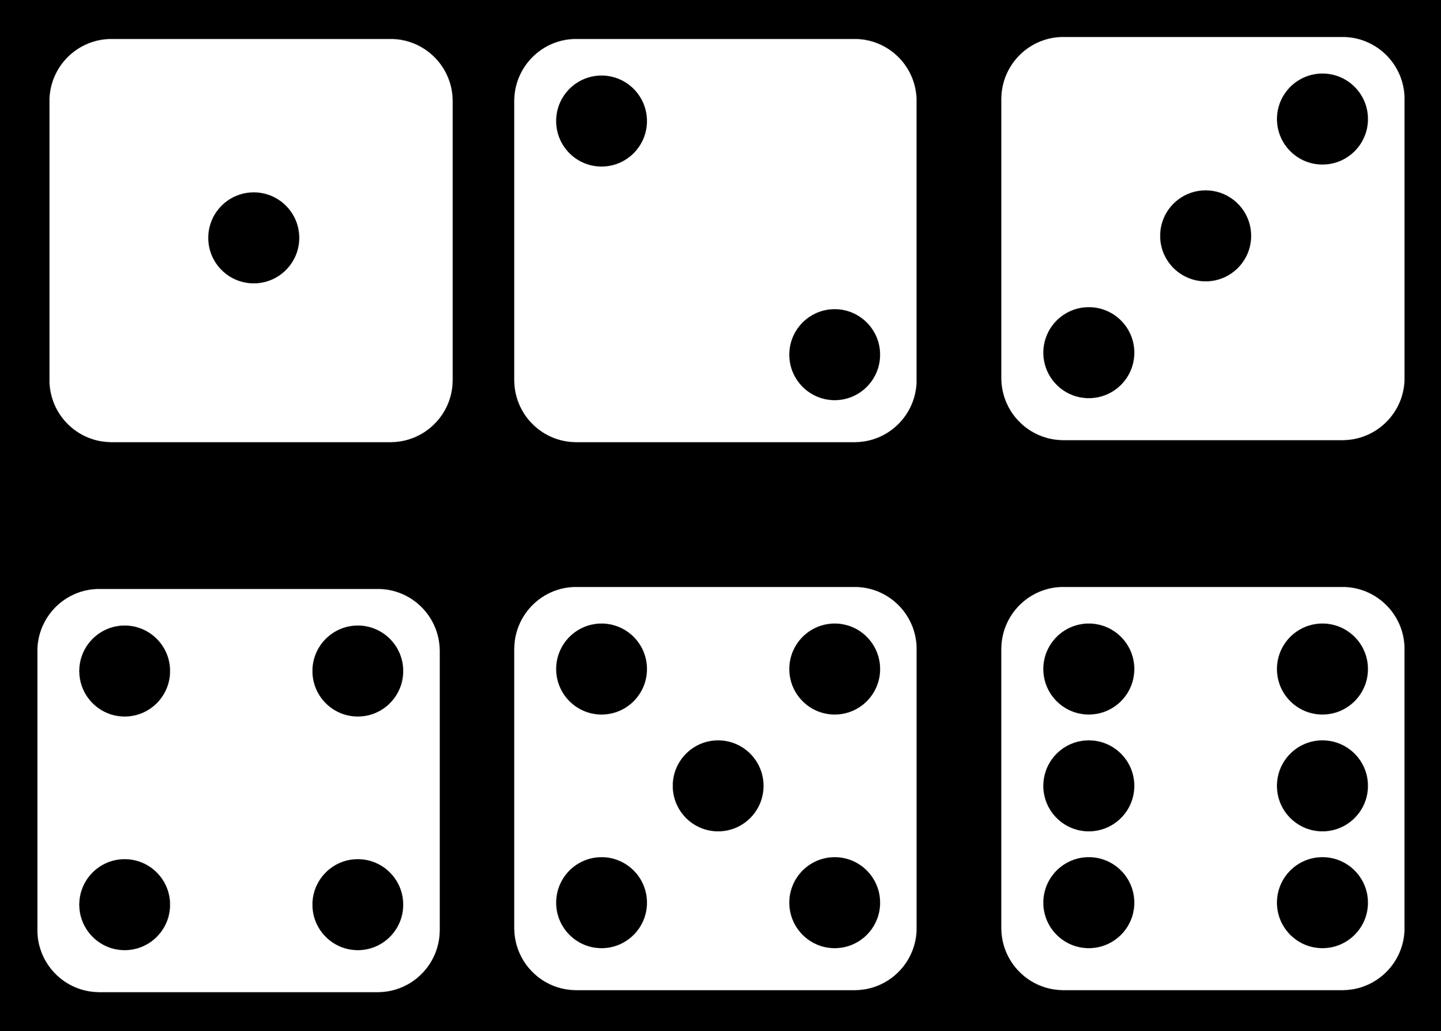 dice print very popular images print n van de bouwplaten print dice